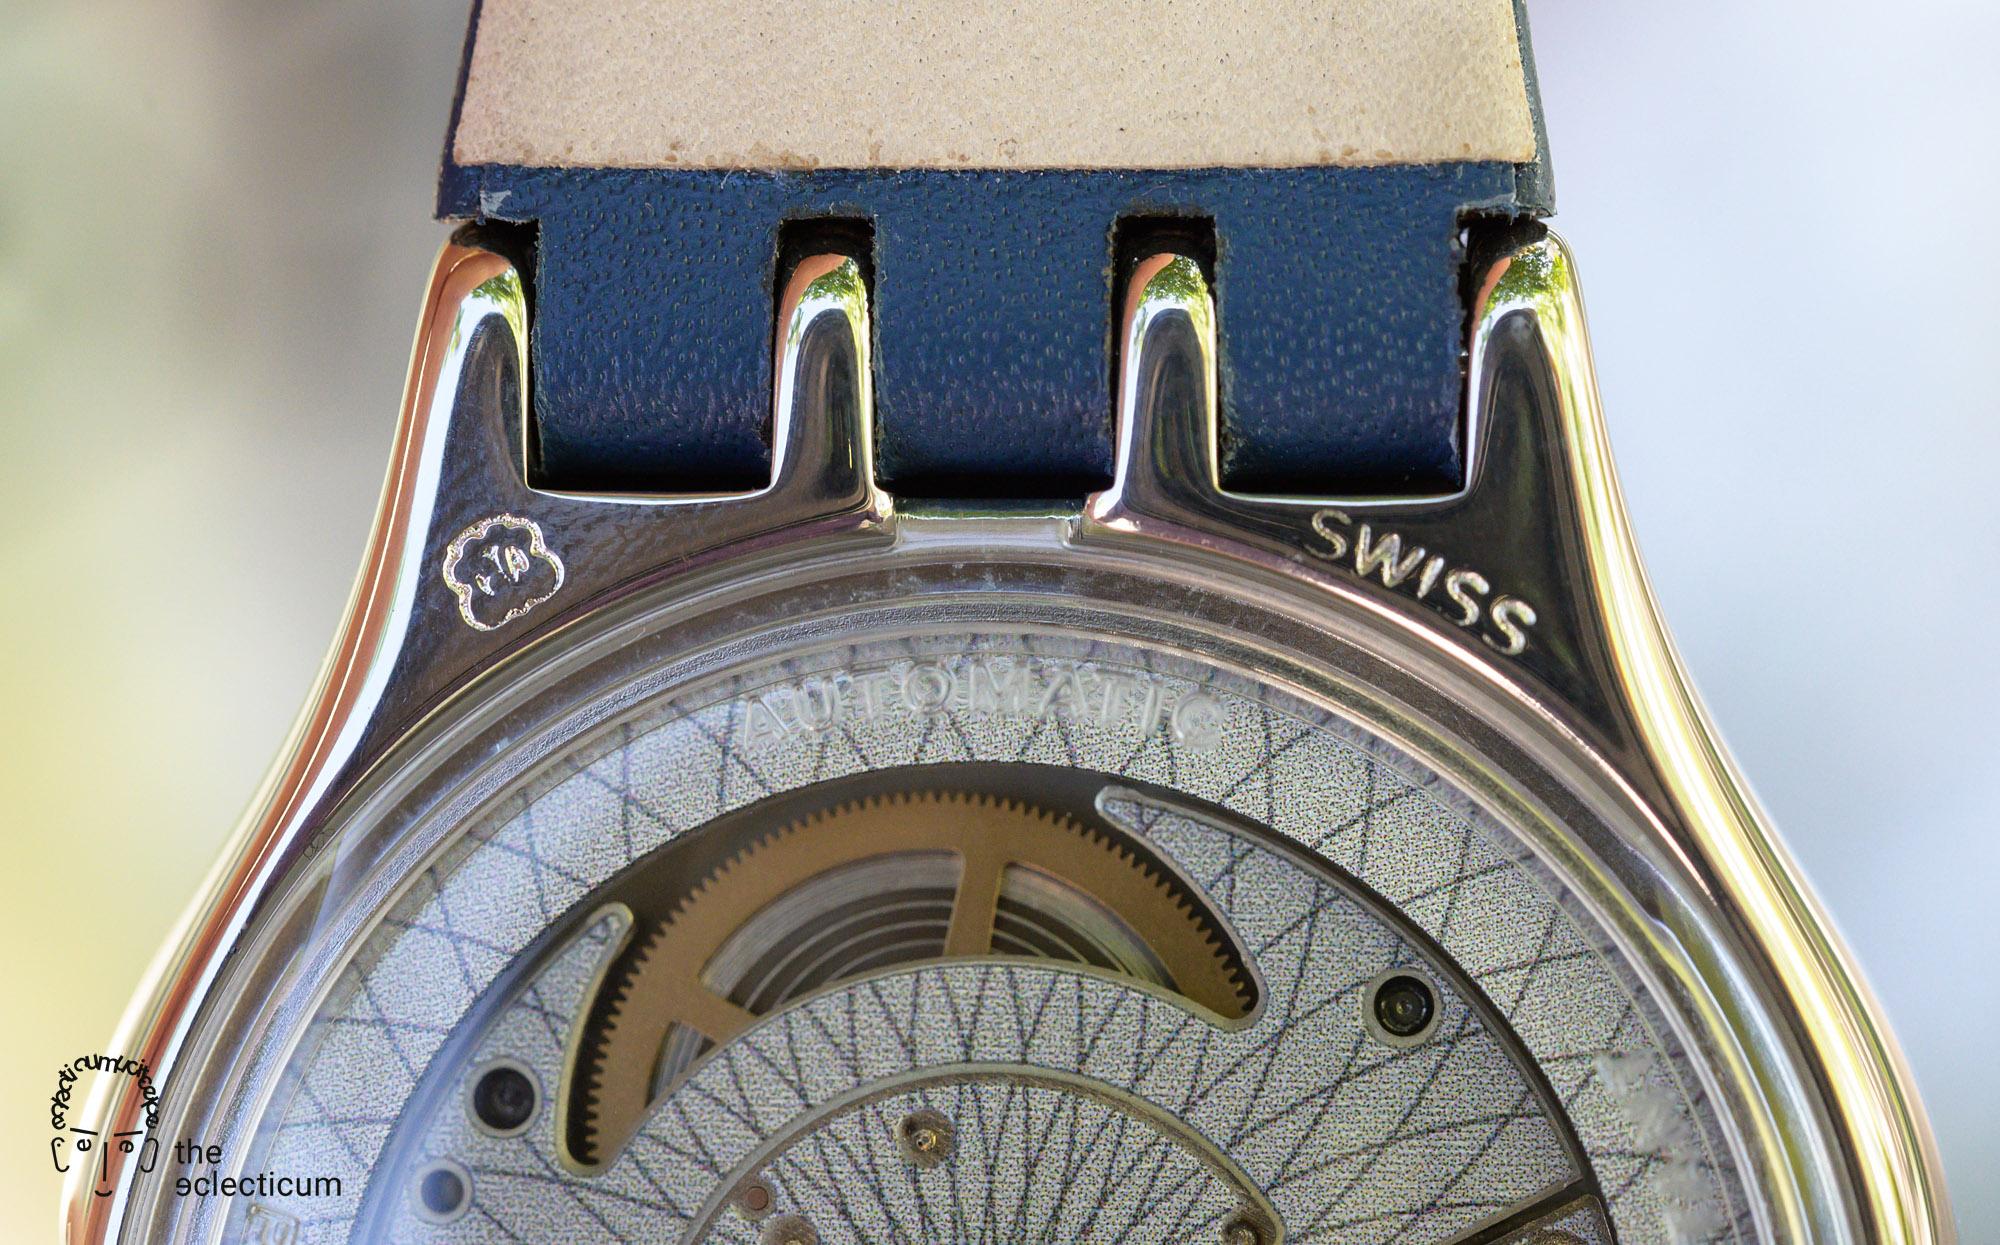 Swatch Sistem51 Petite Seconde automatic blue dial caseback ETA